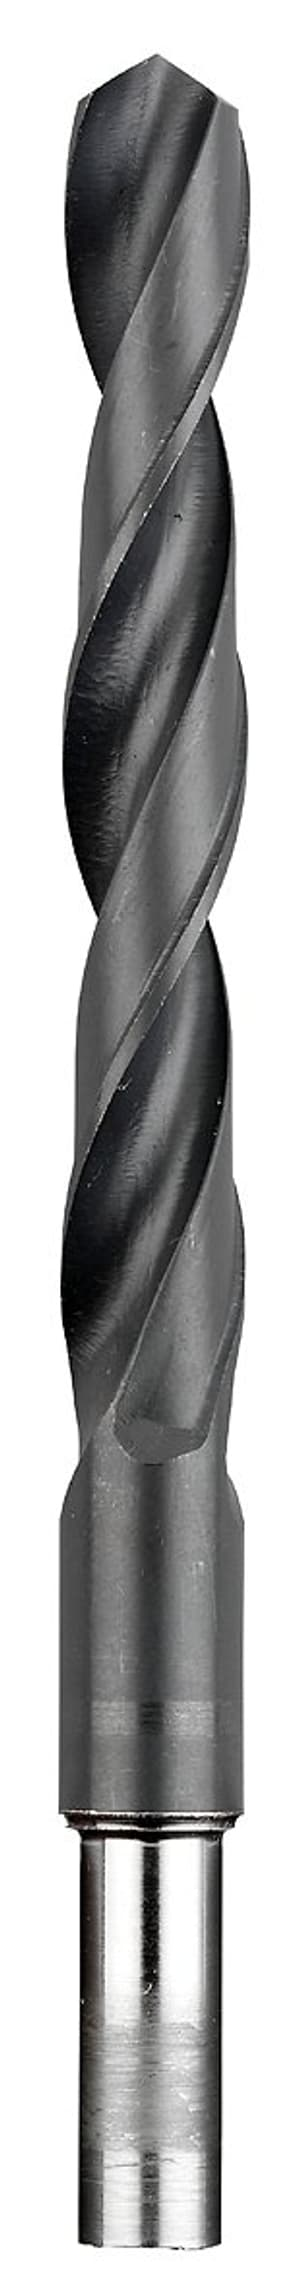 HSS Spiralbohrer mit abgedrehtem Schaft, ø 16.0 mm